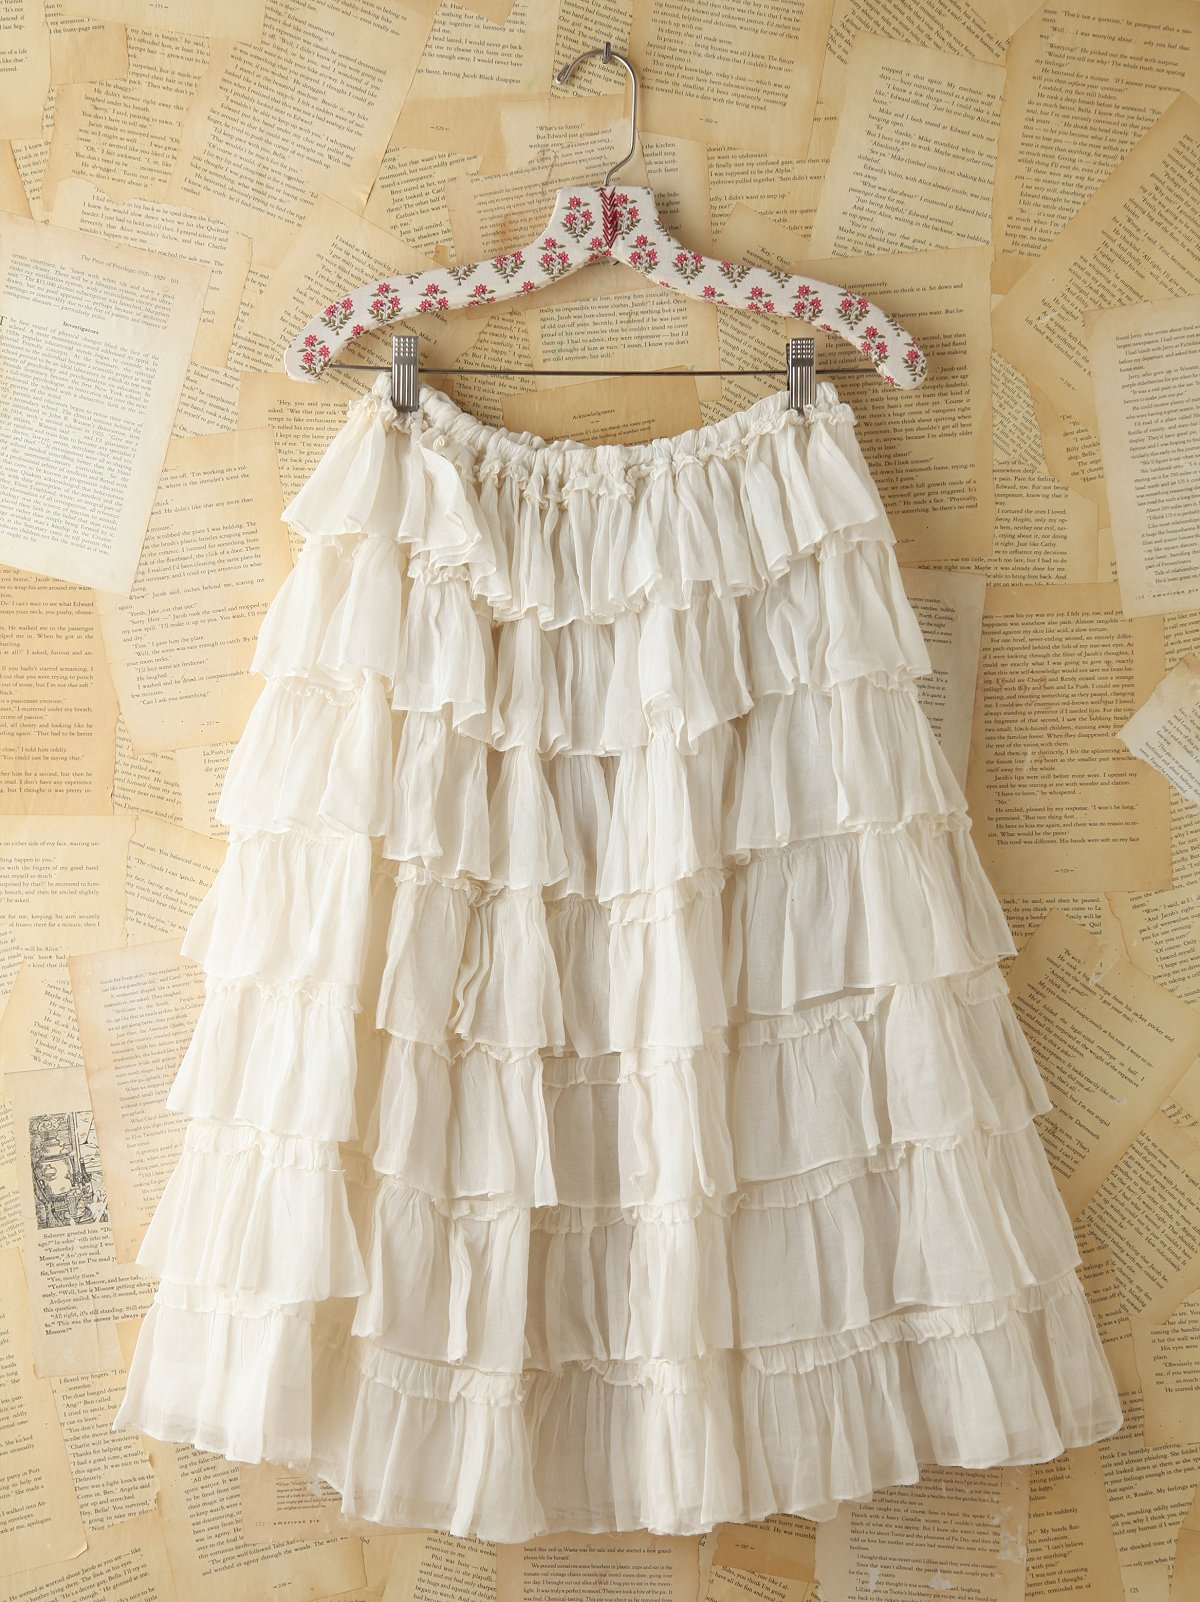 Vinage Tiered Ruffle Skirt